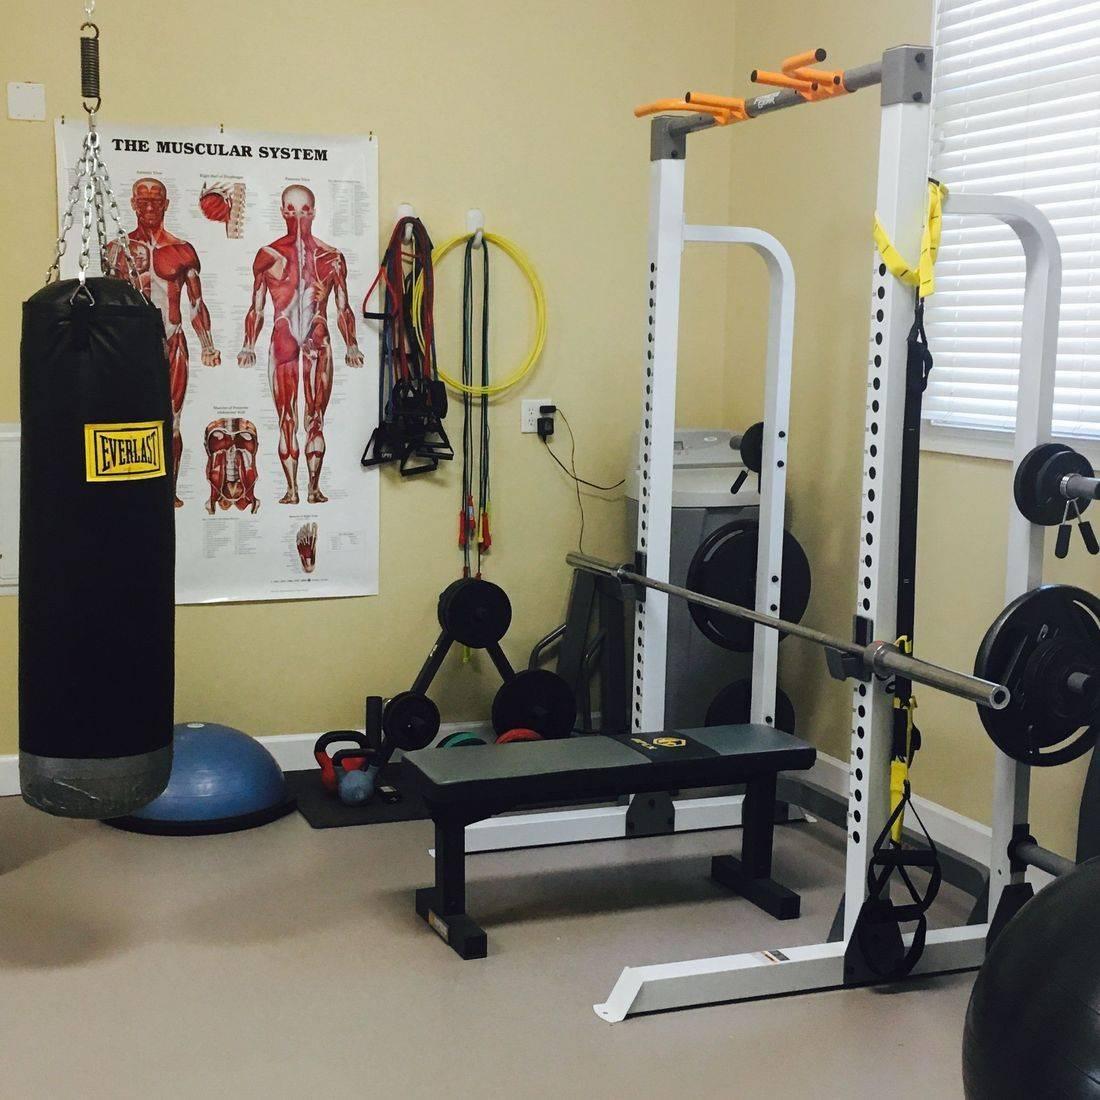 personal training studio savannah ga, personal traning savannah ga